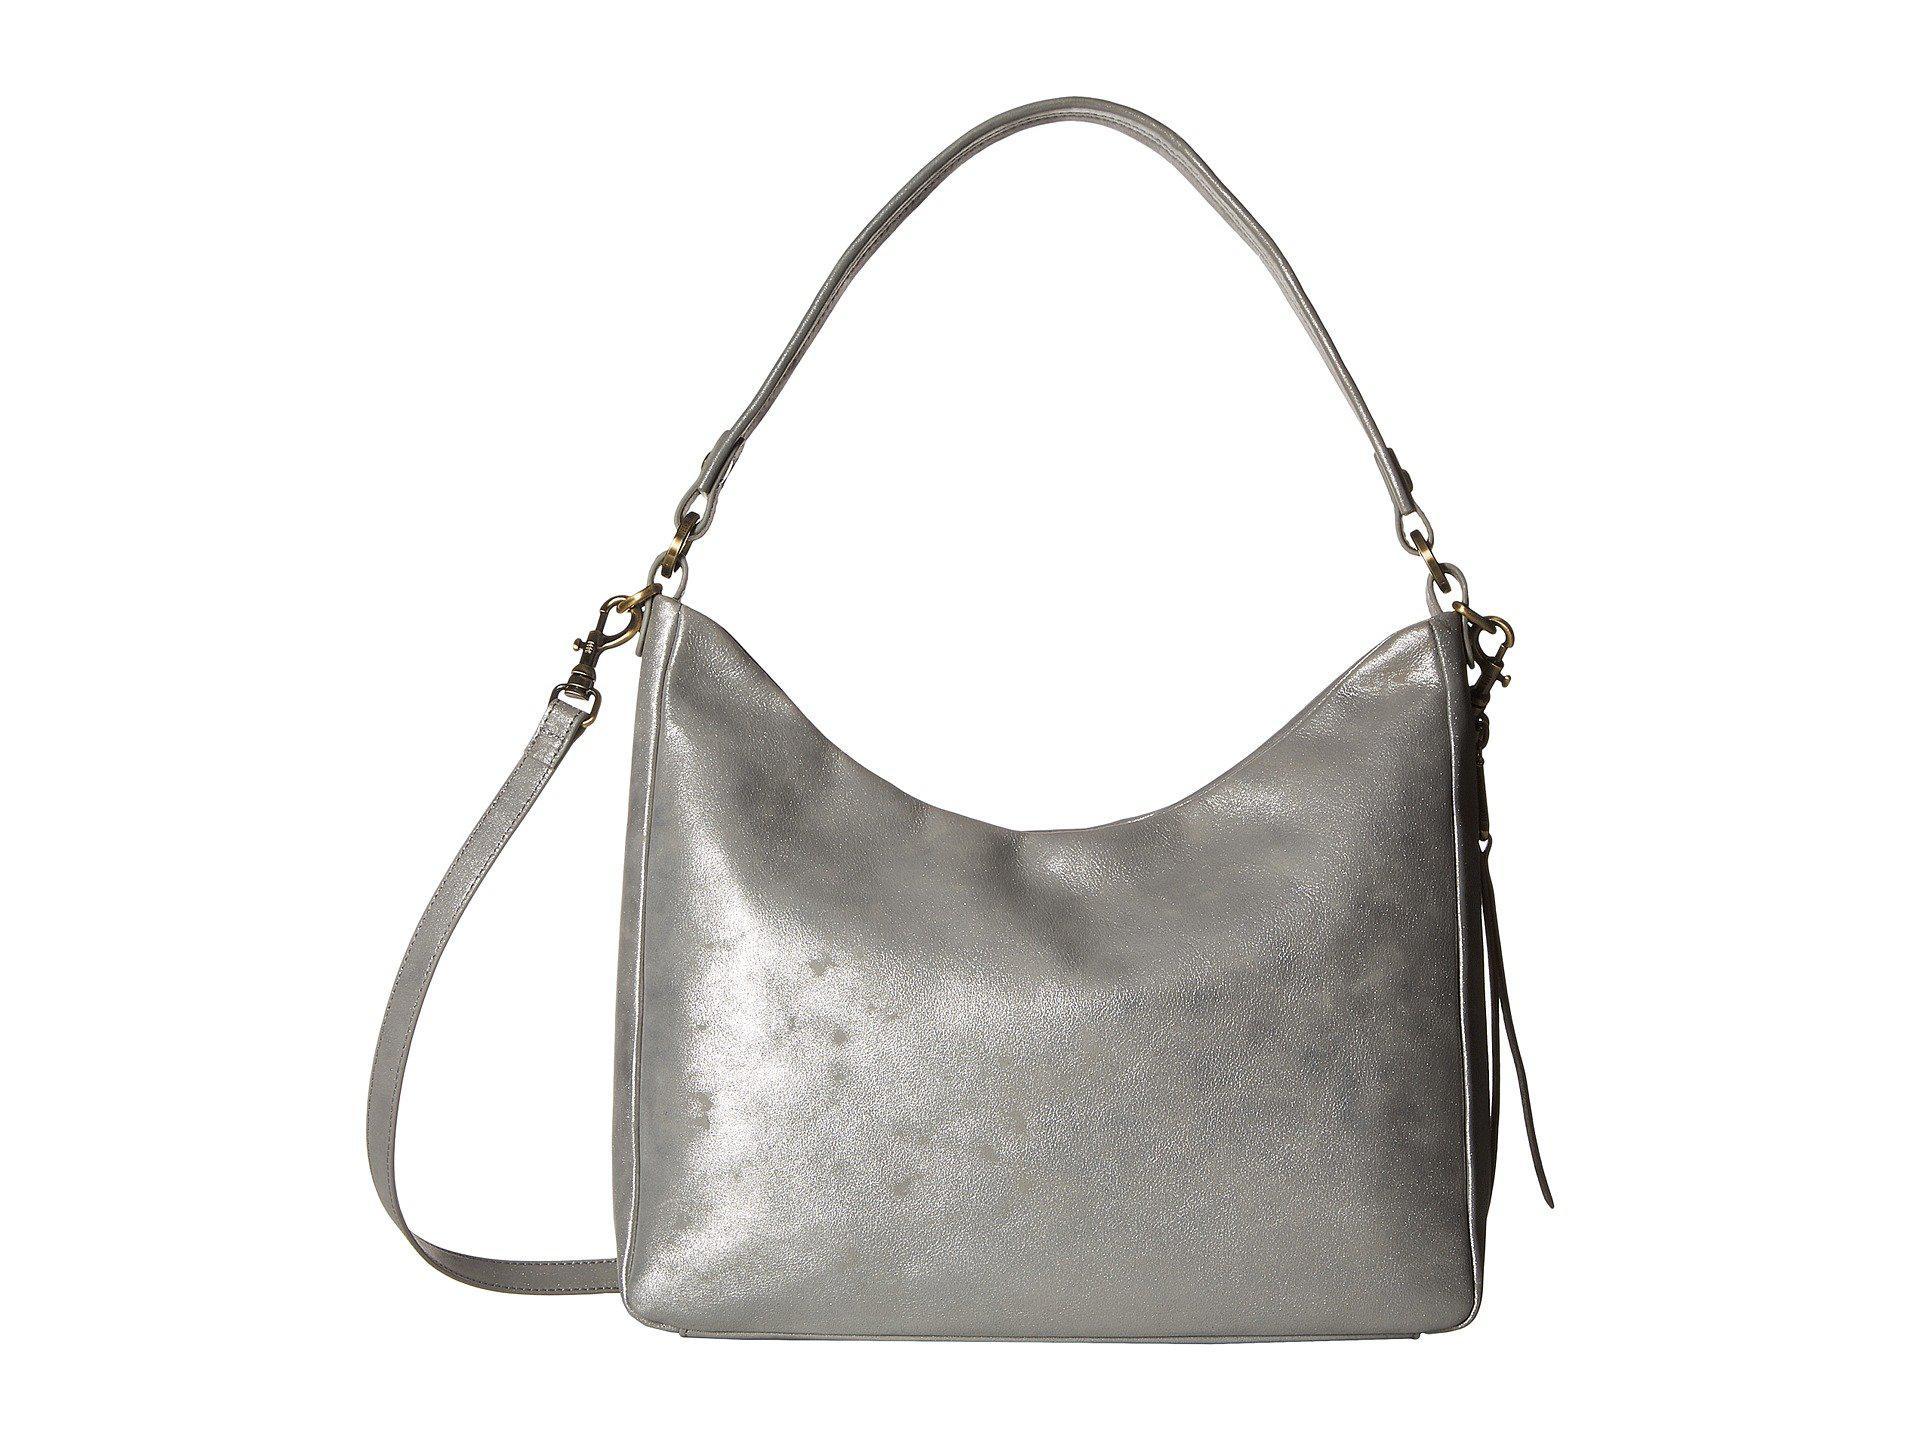 df34f6349 Hobo Delilah (moss) Handbags in Gray - Lyst